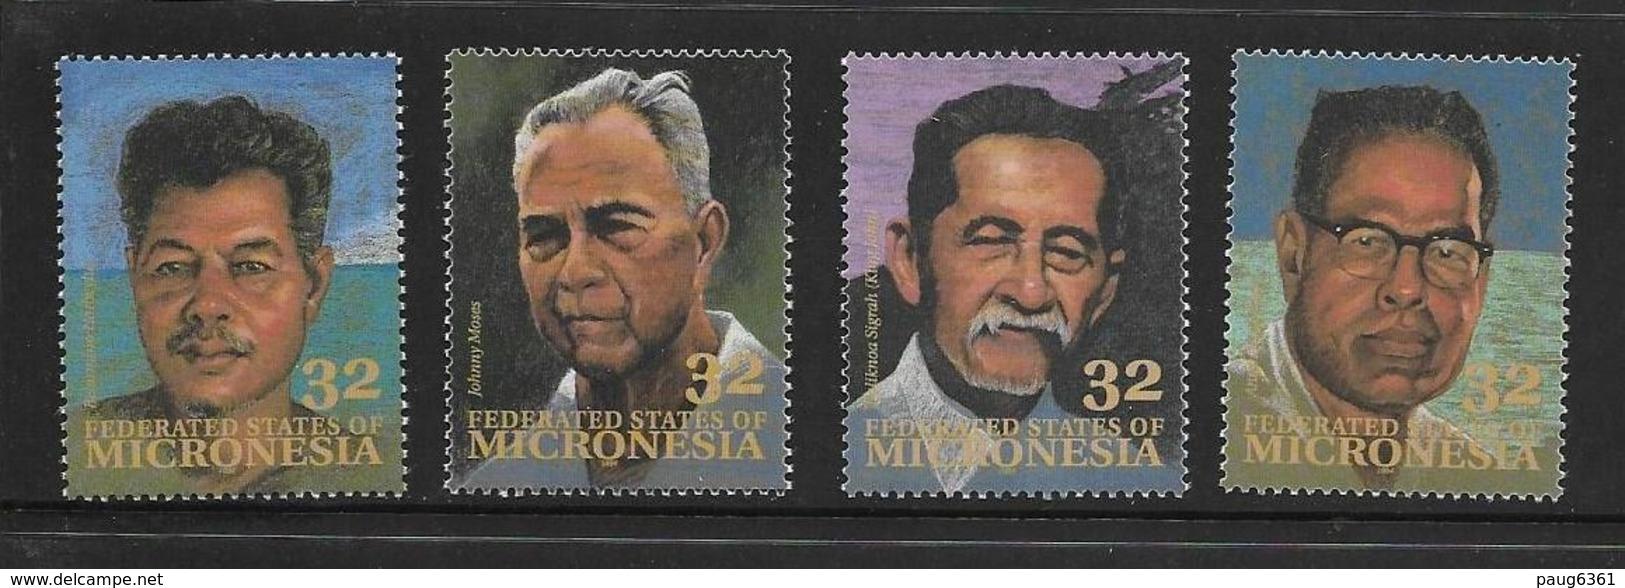 MICRONESIE 1994 CELEBRITES  YVERT N°328/33  NEUF MNH** - Micronésie